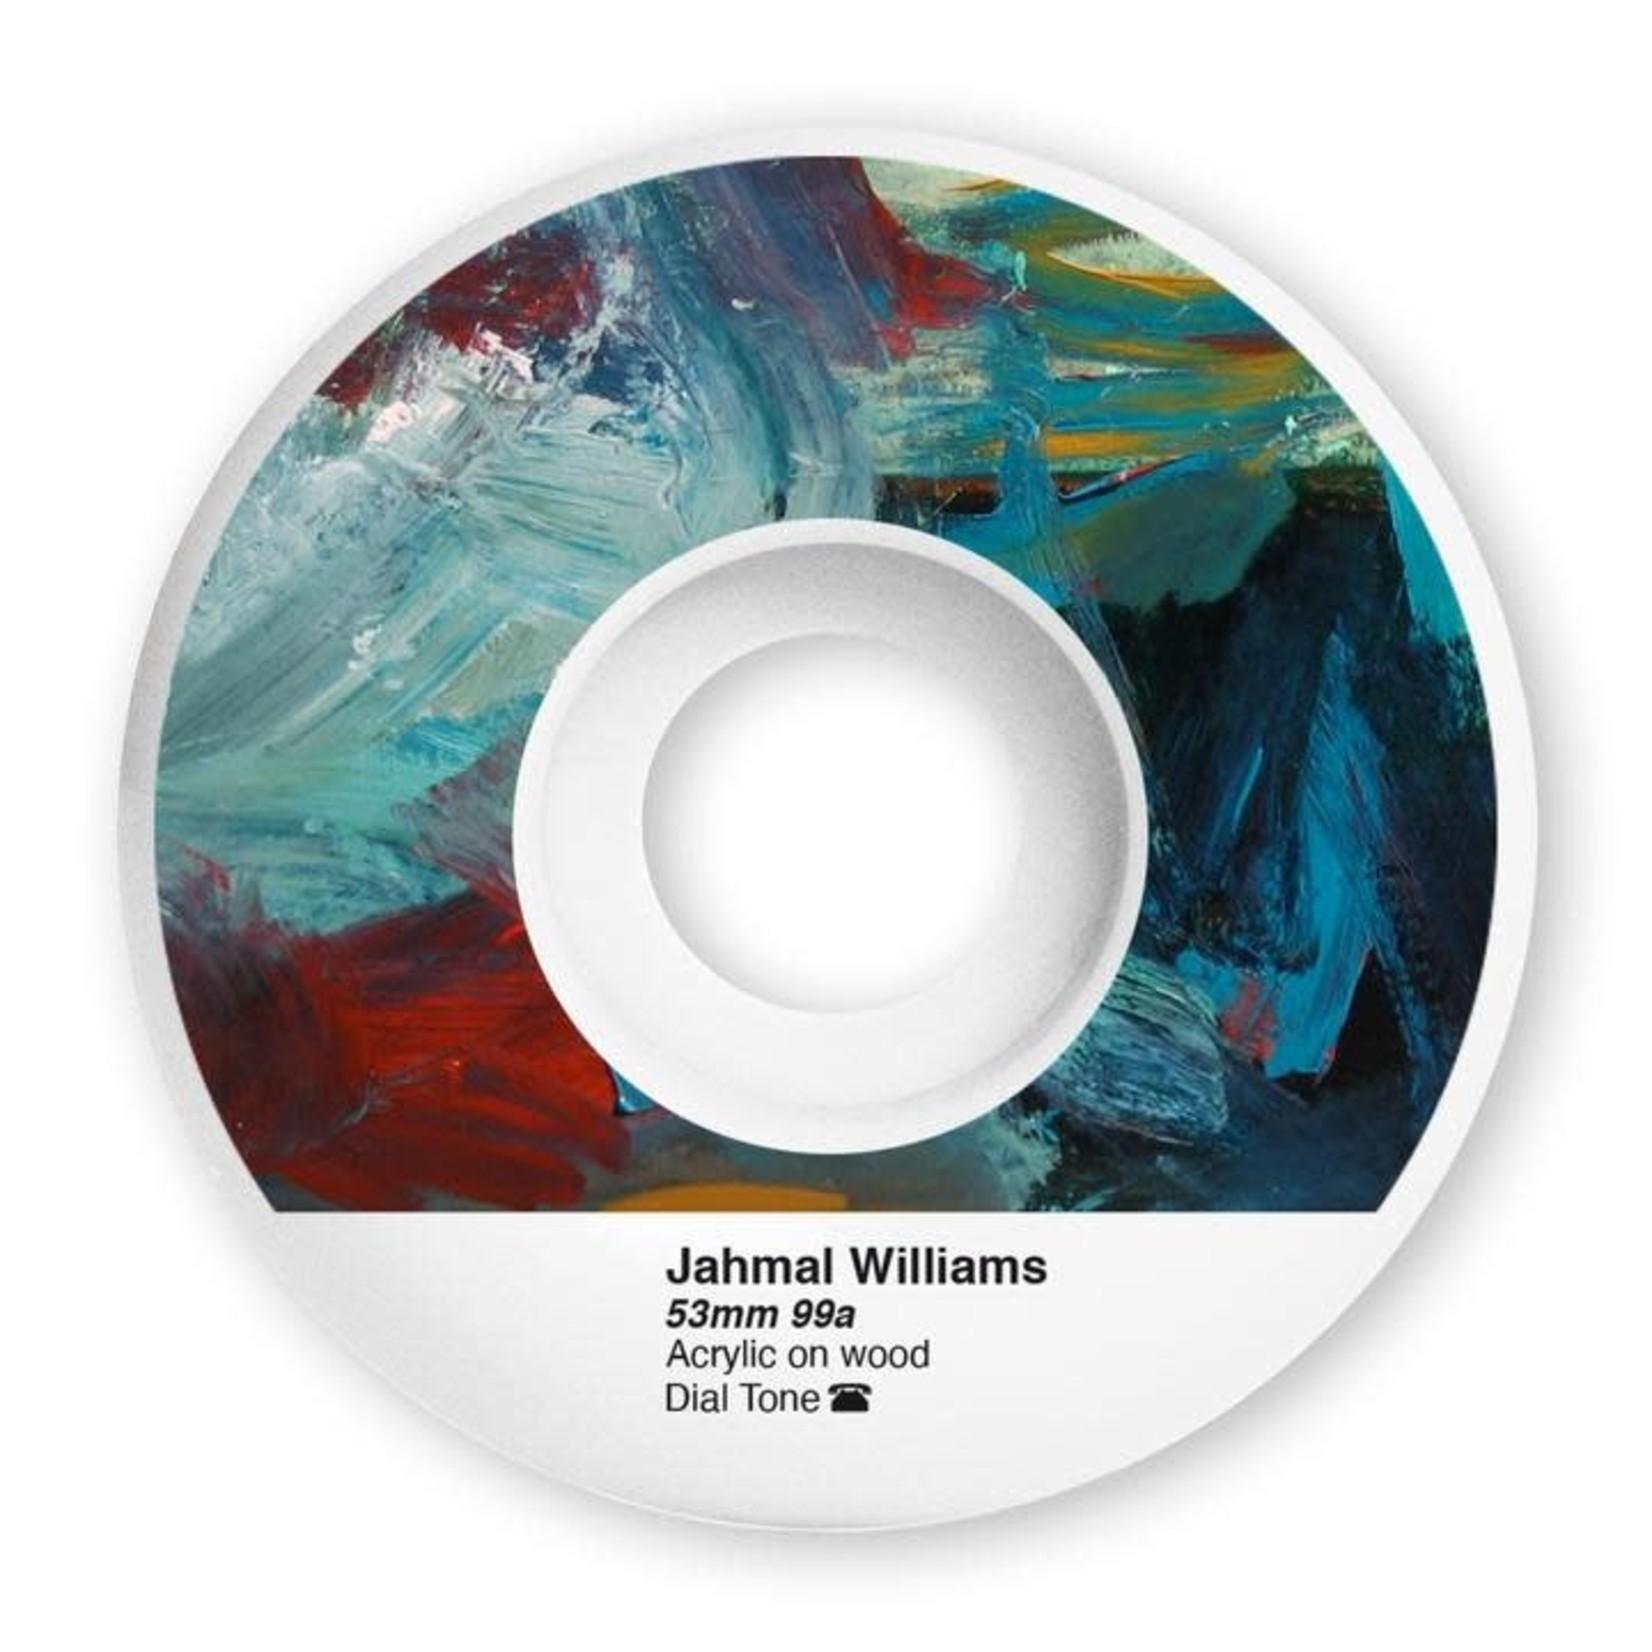 Dial Tone Dial Tone Williams Acrylic Standard Wheels